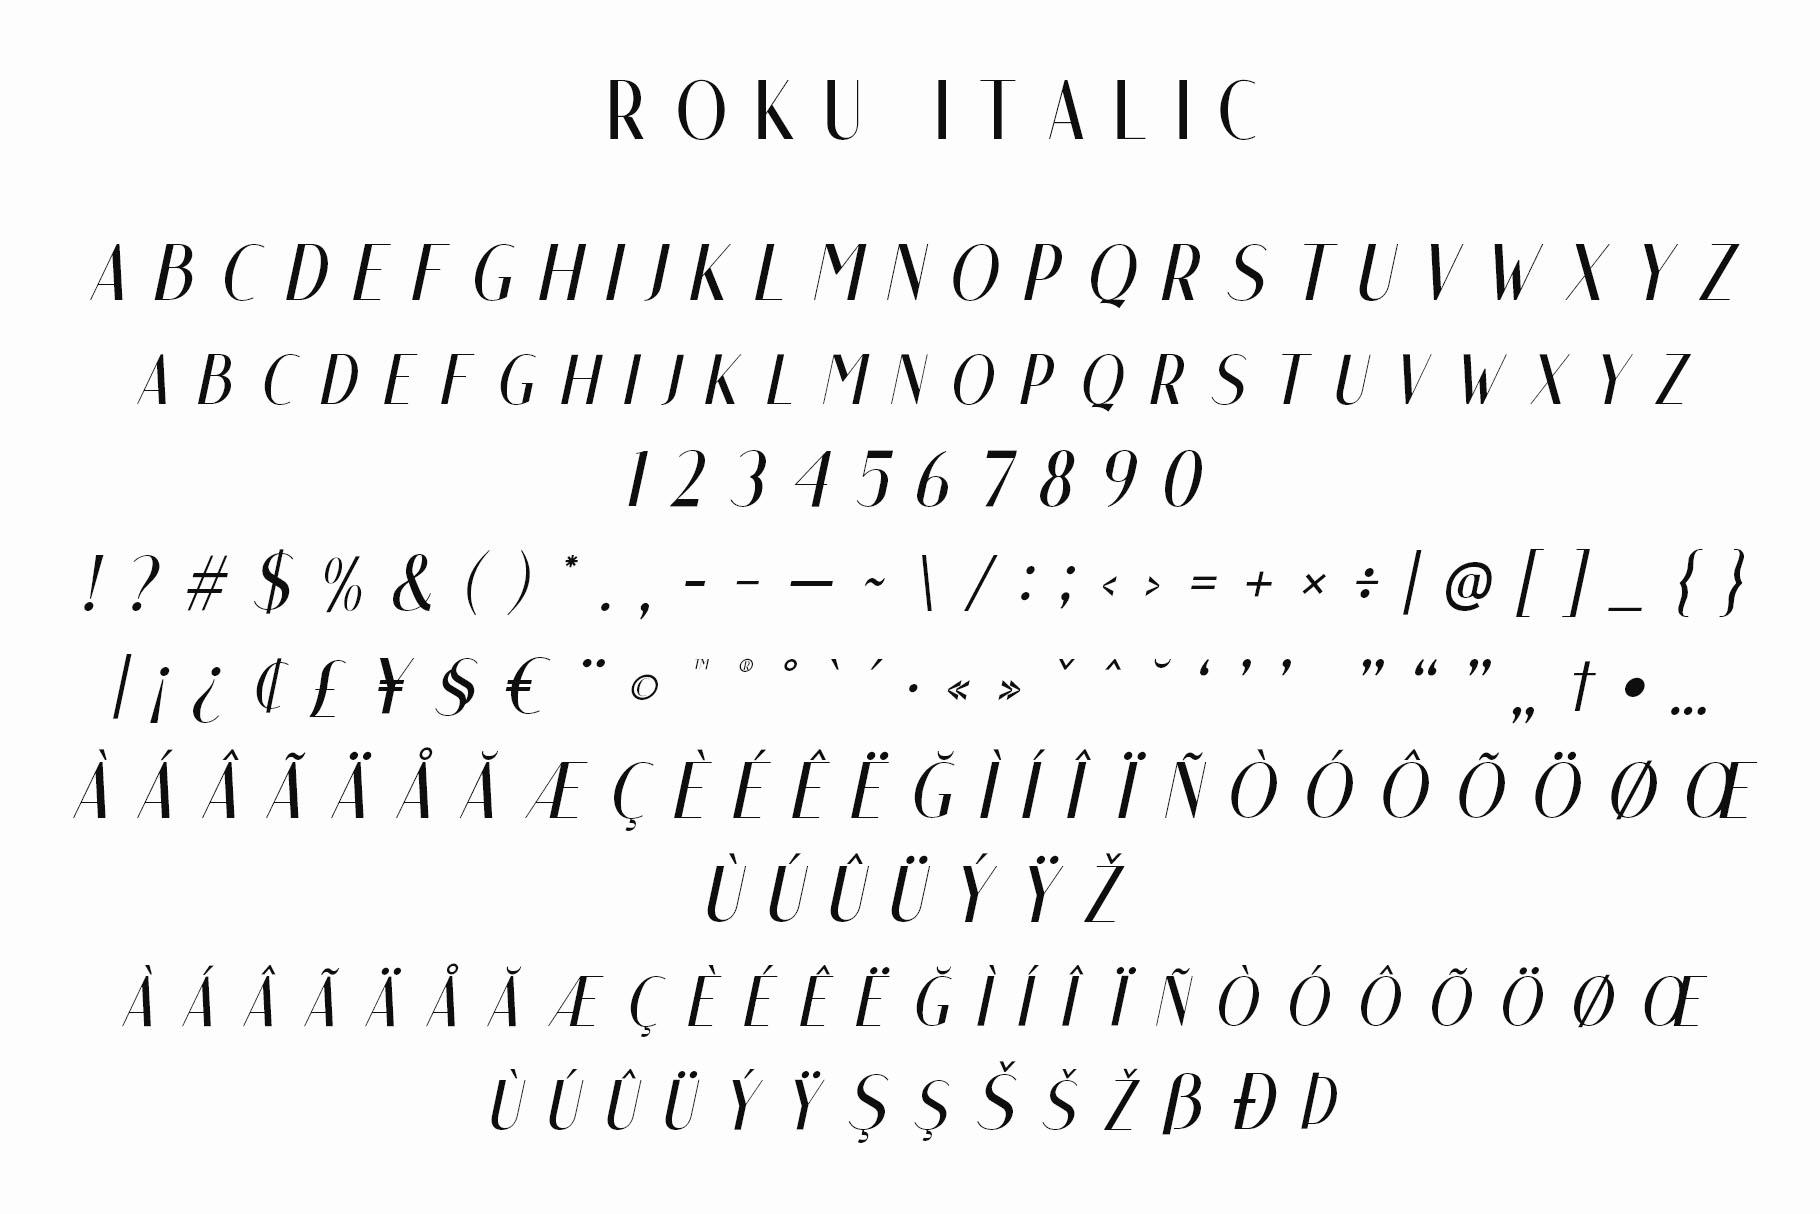 Roku - Modern Sans Serif example image 5